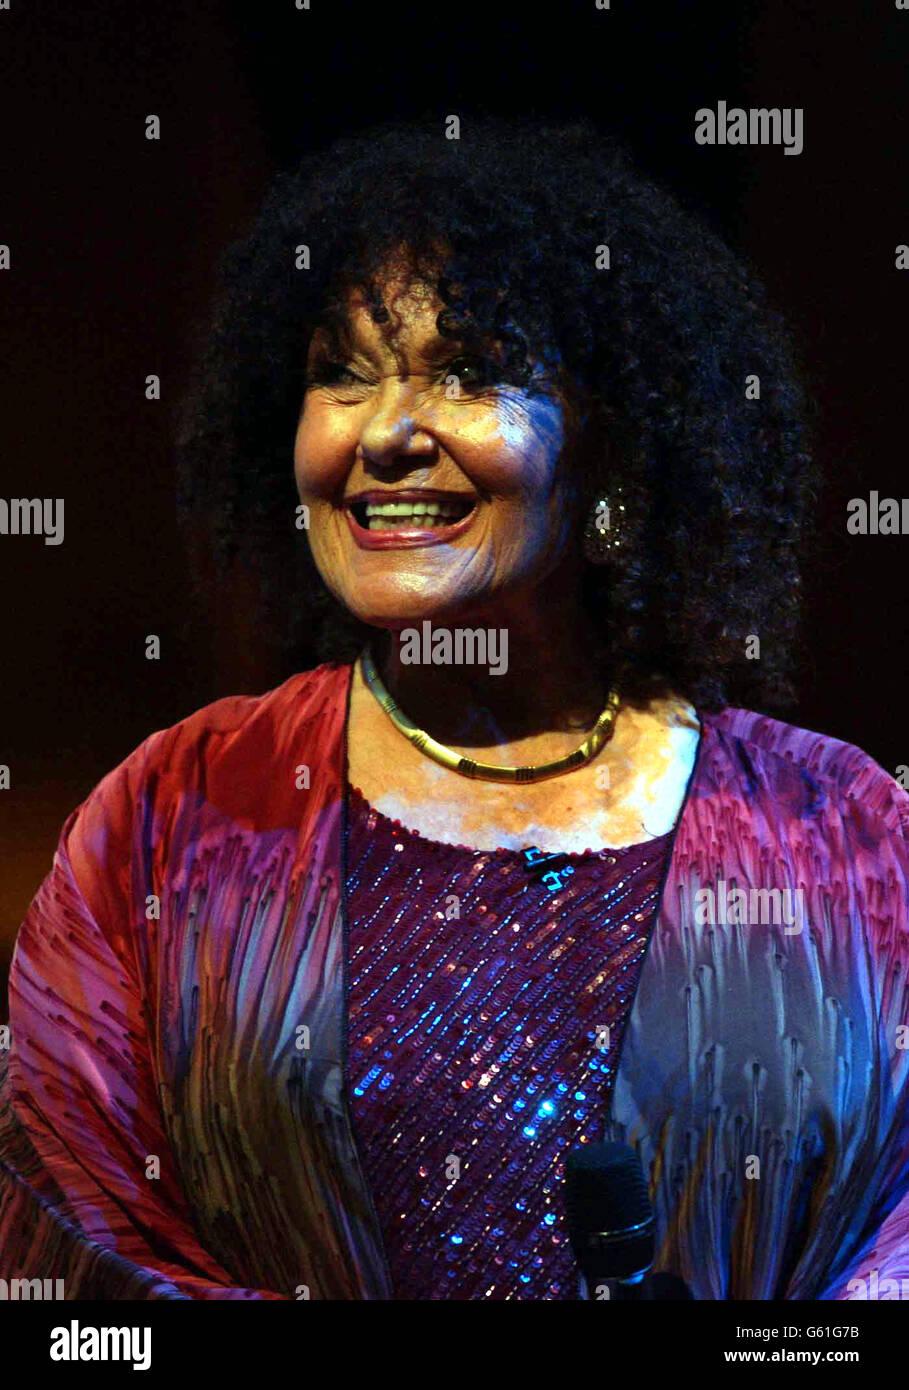 Cleo Lane Spike Milligan Tribute Stock Photo Alamy